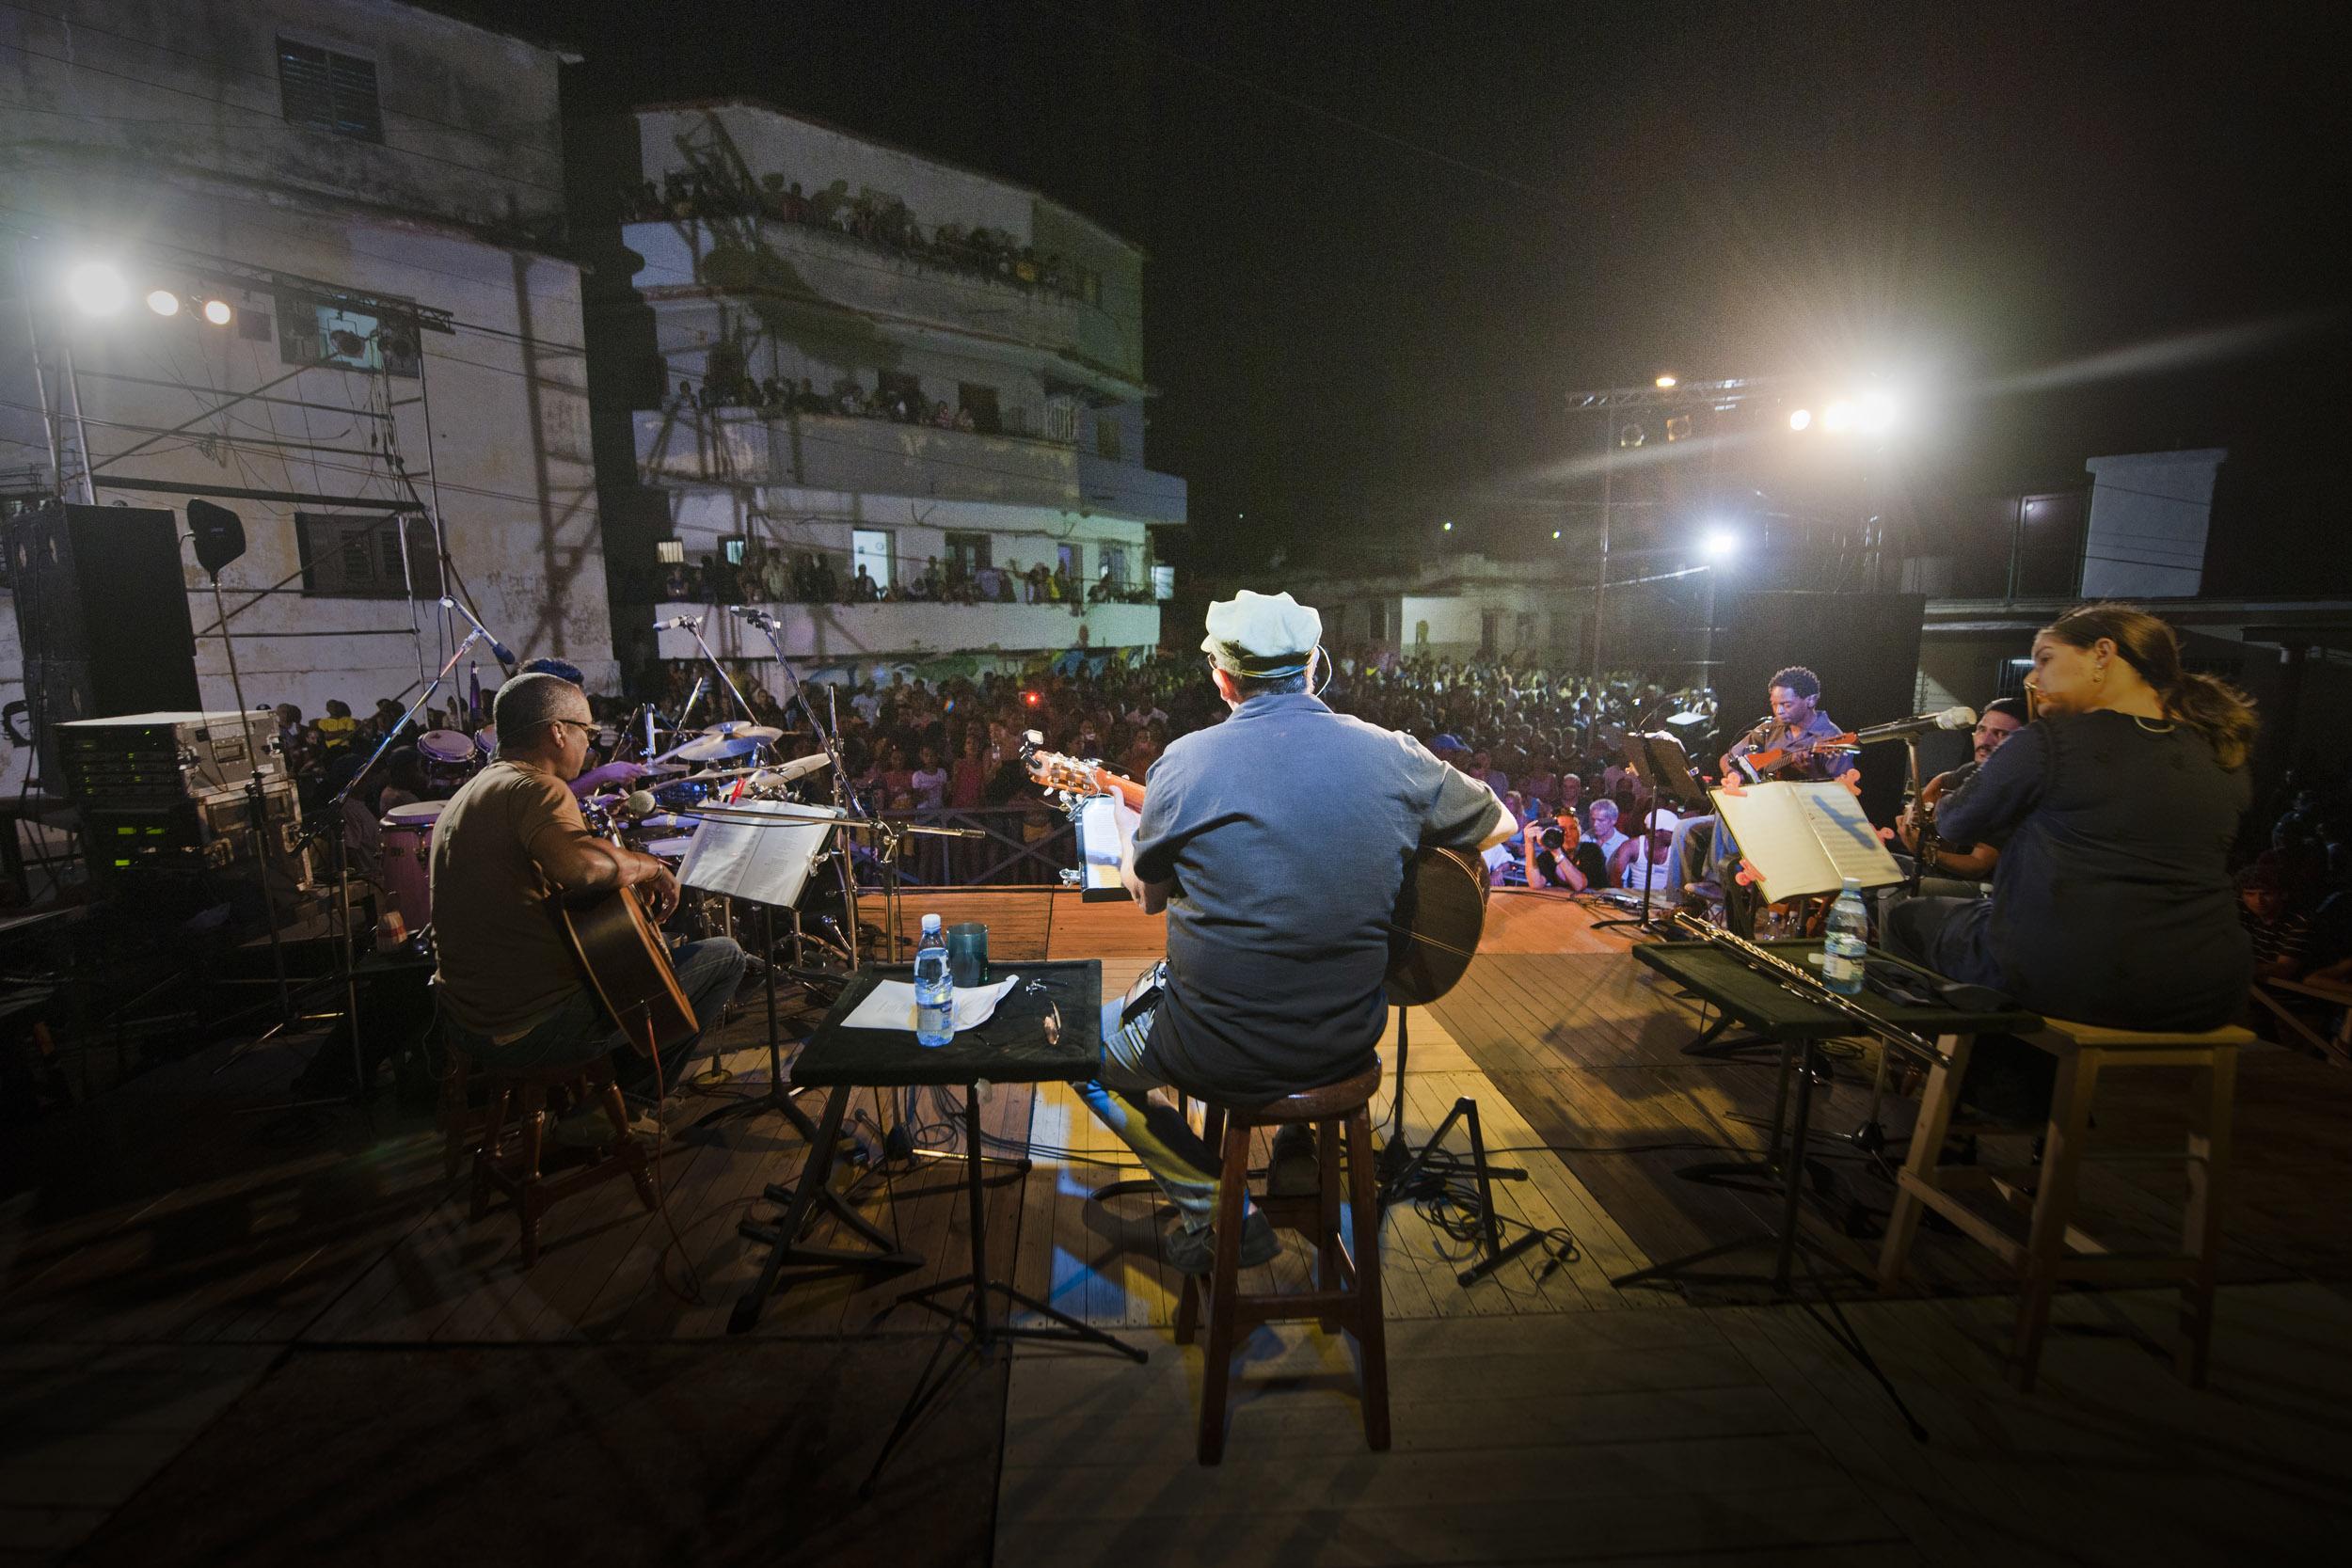 Silvio Rodríguez, musician - Illuminated Cuba - Hector Garrido, Aerial and human photography